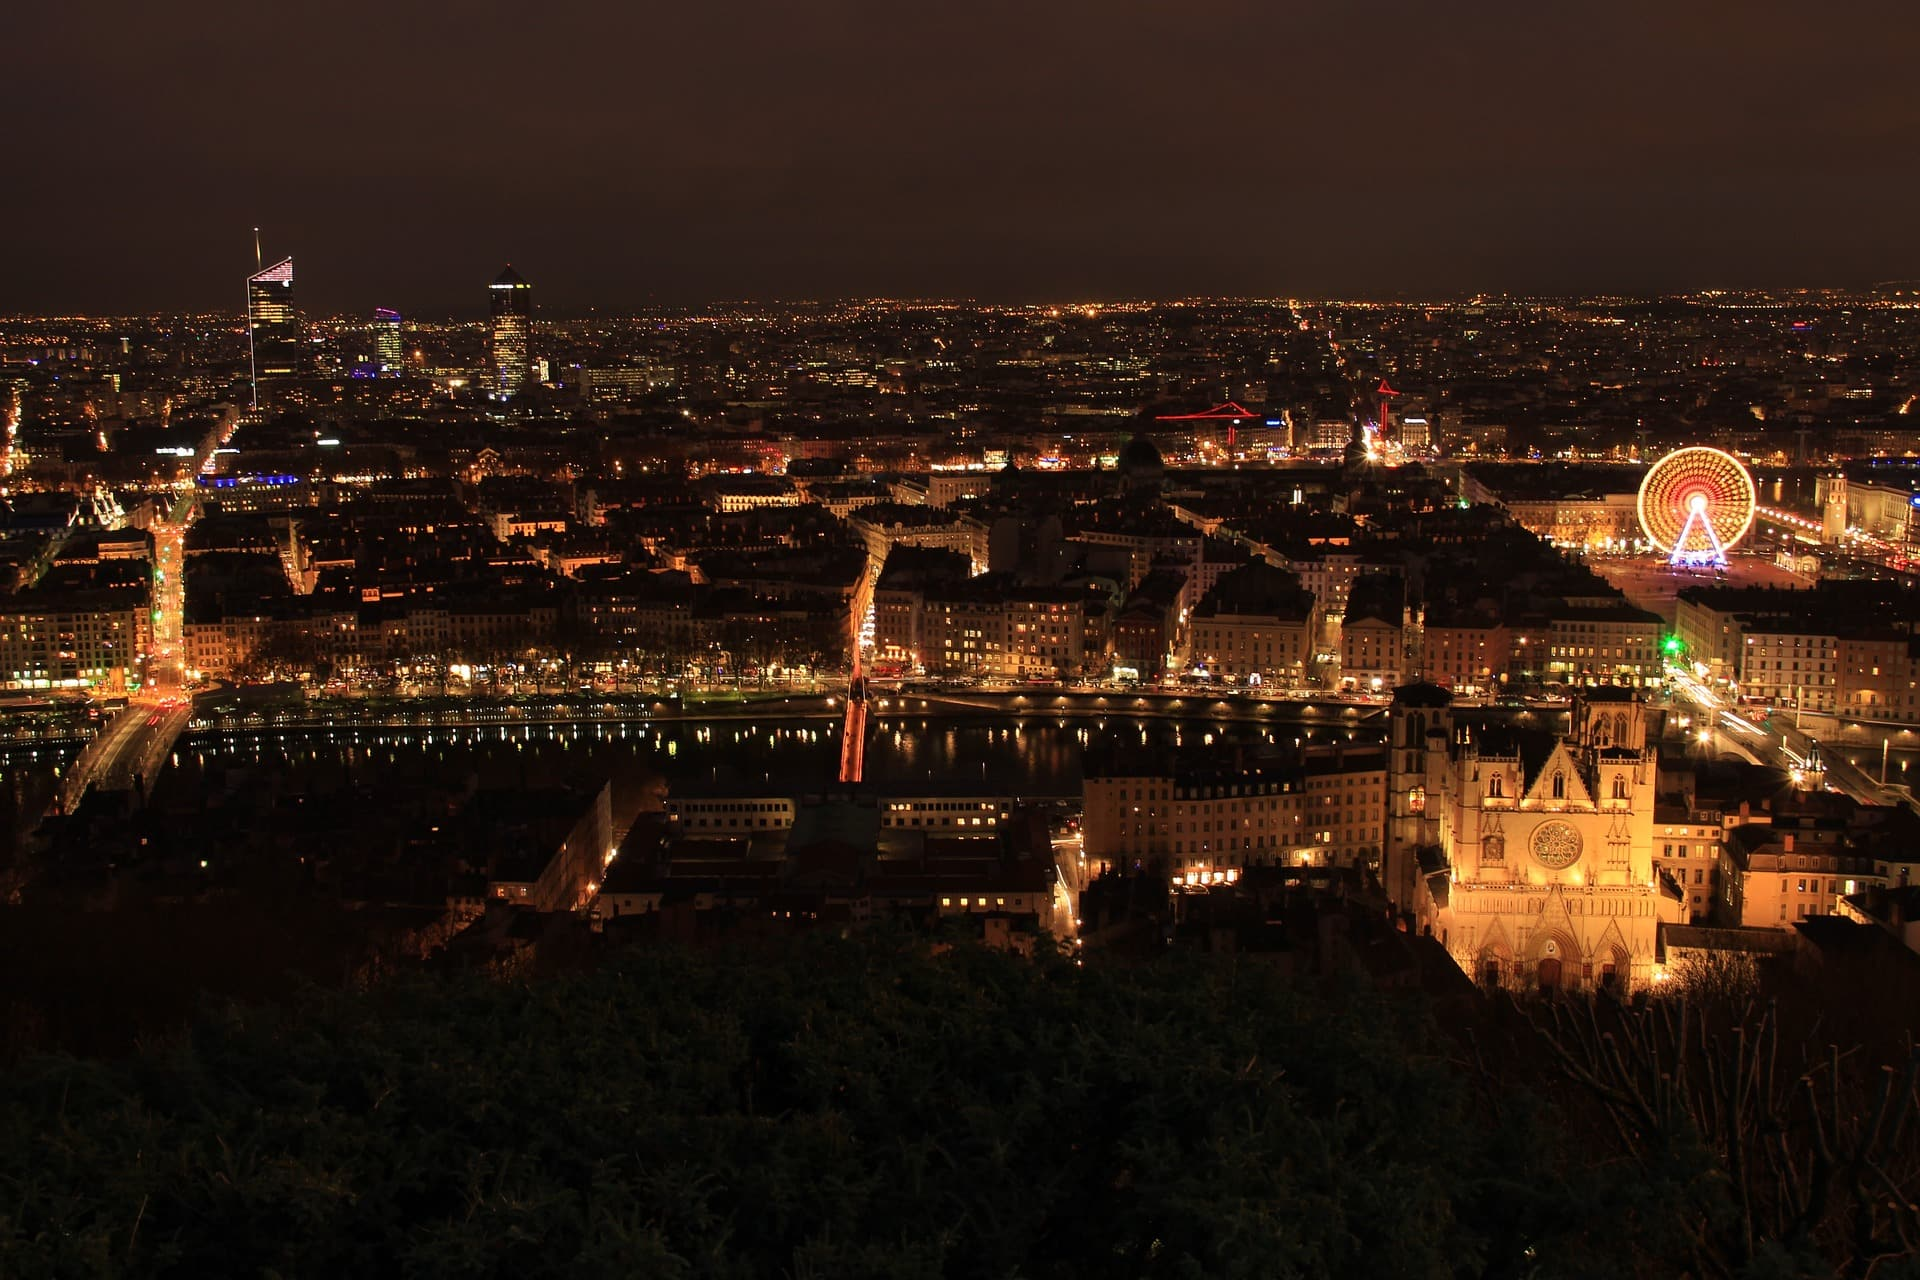 Sortir le soir à Lyon